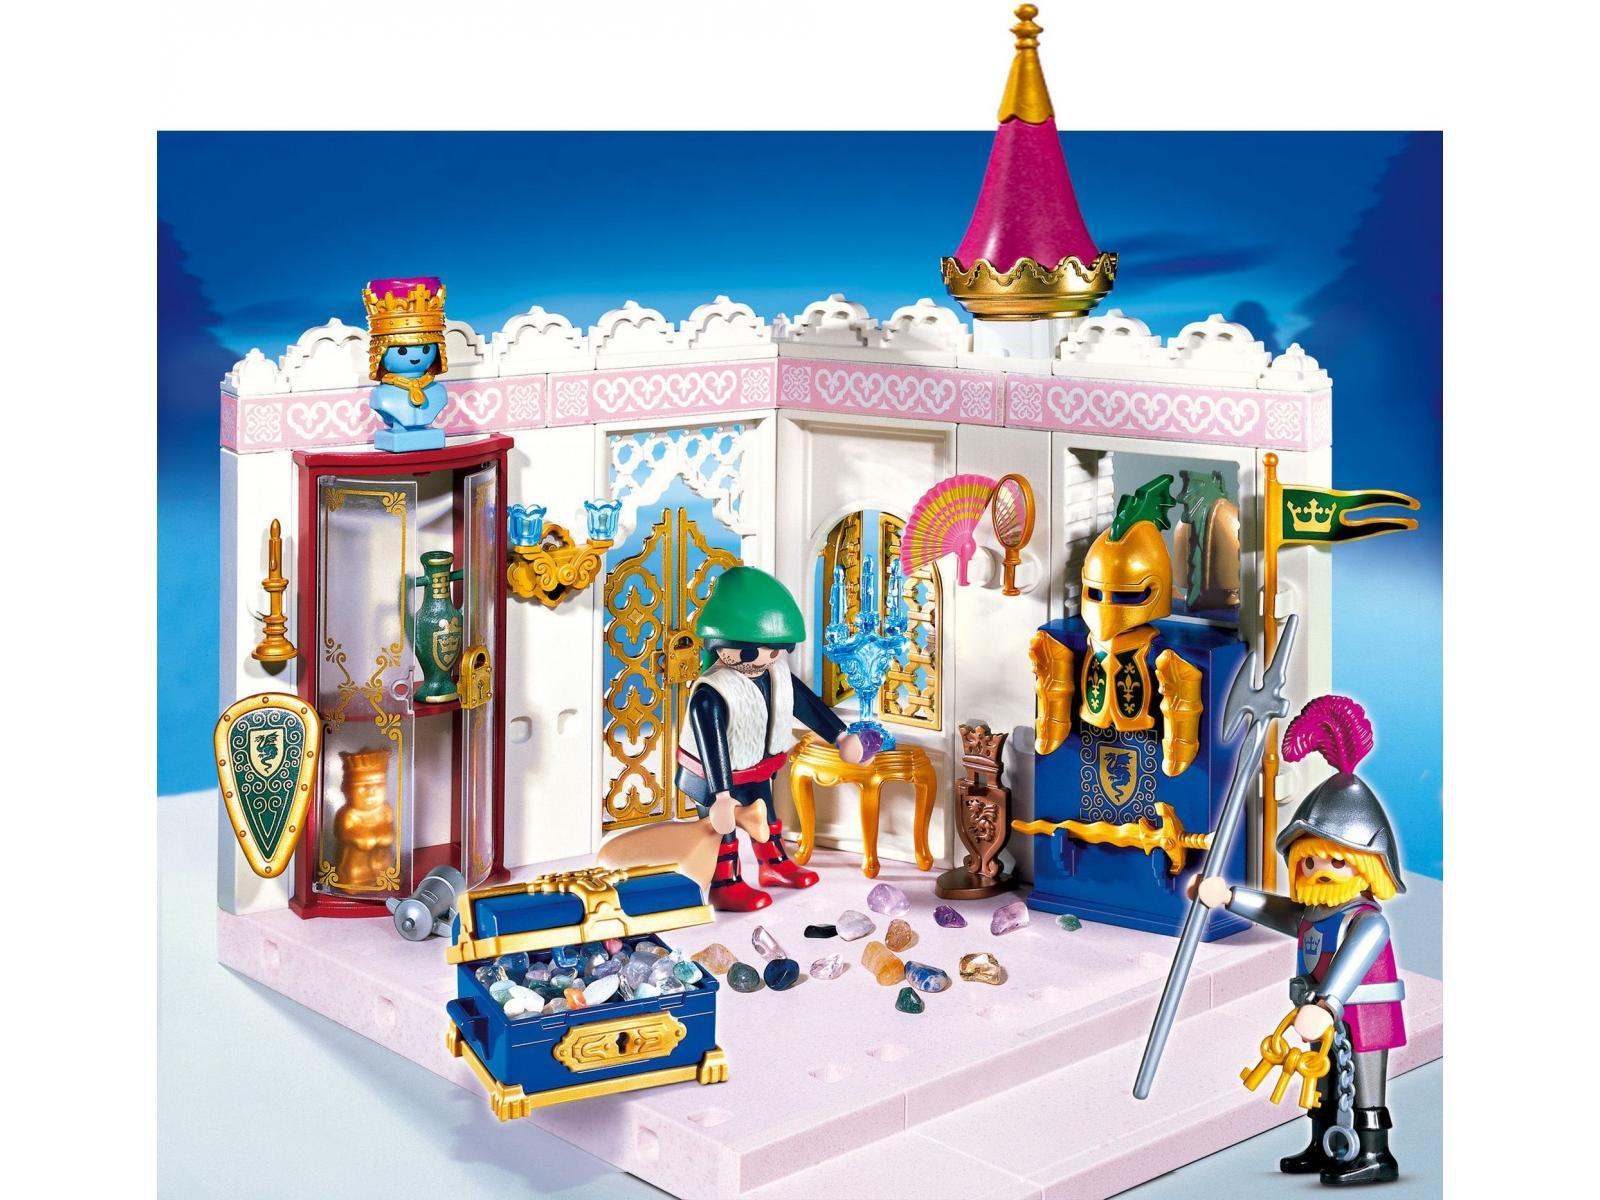 Chambre Princesse Playmobil : princesse playmobil château playmobil ...